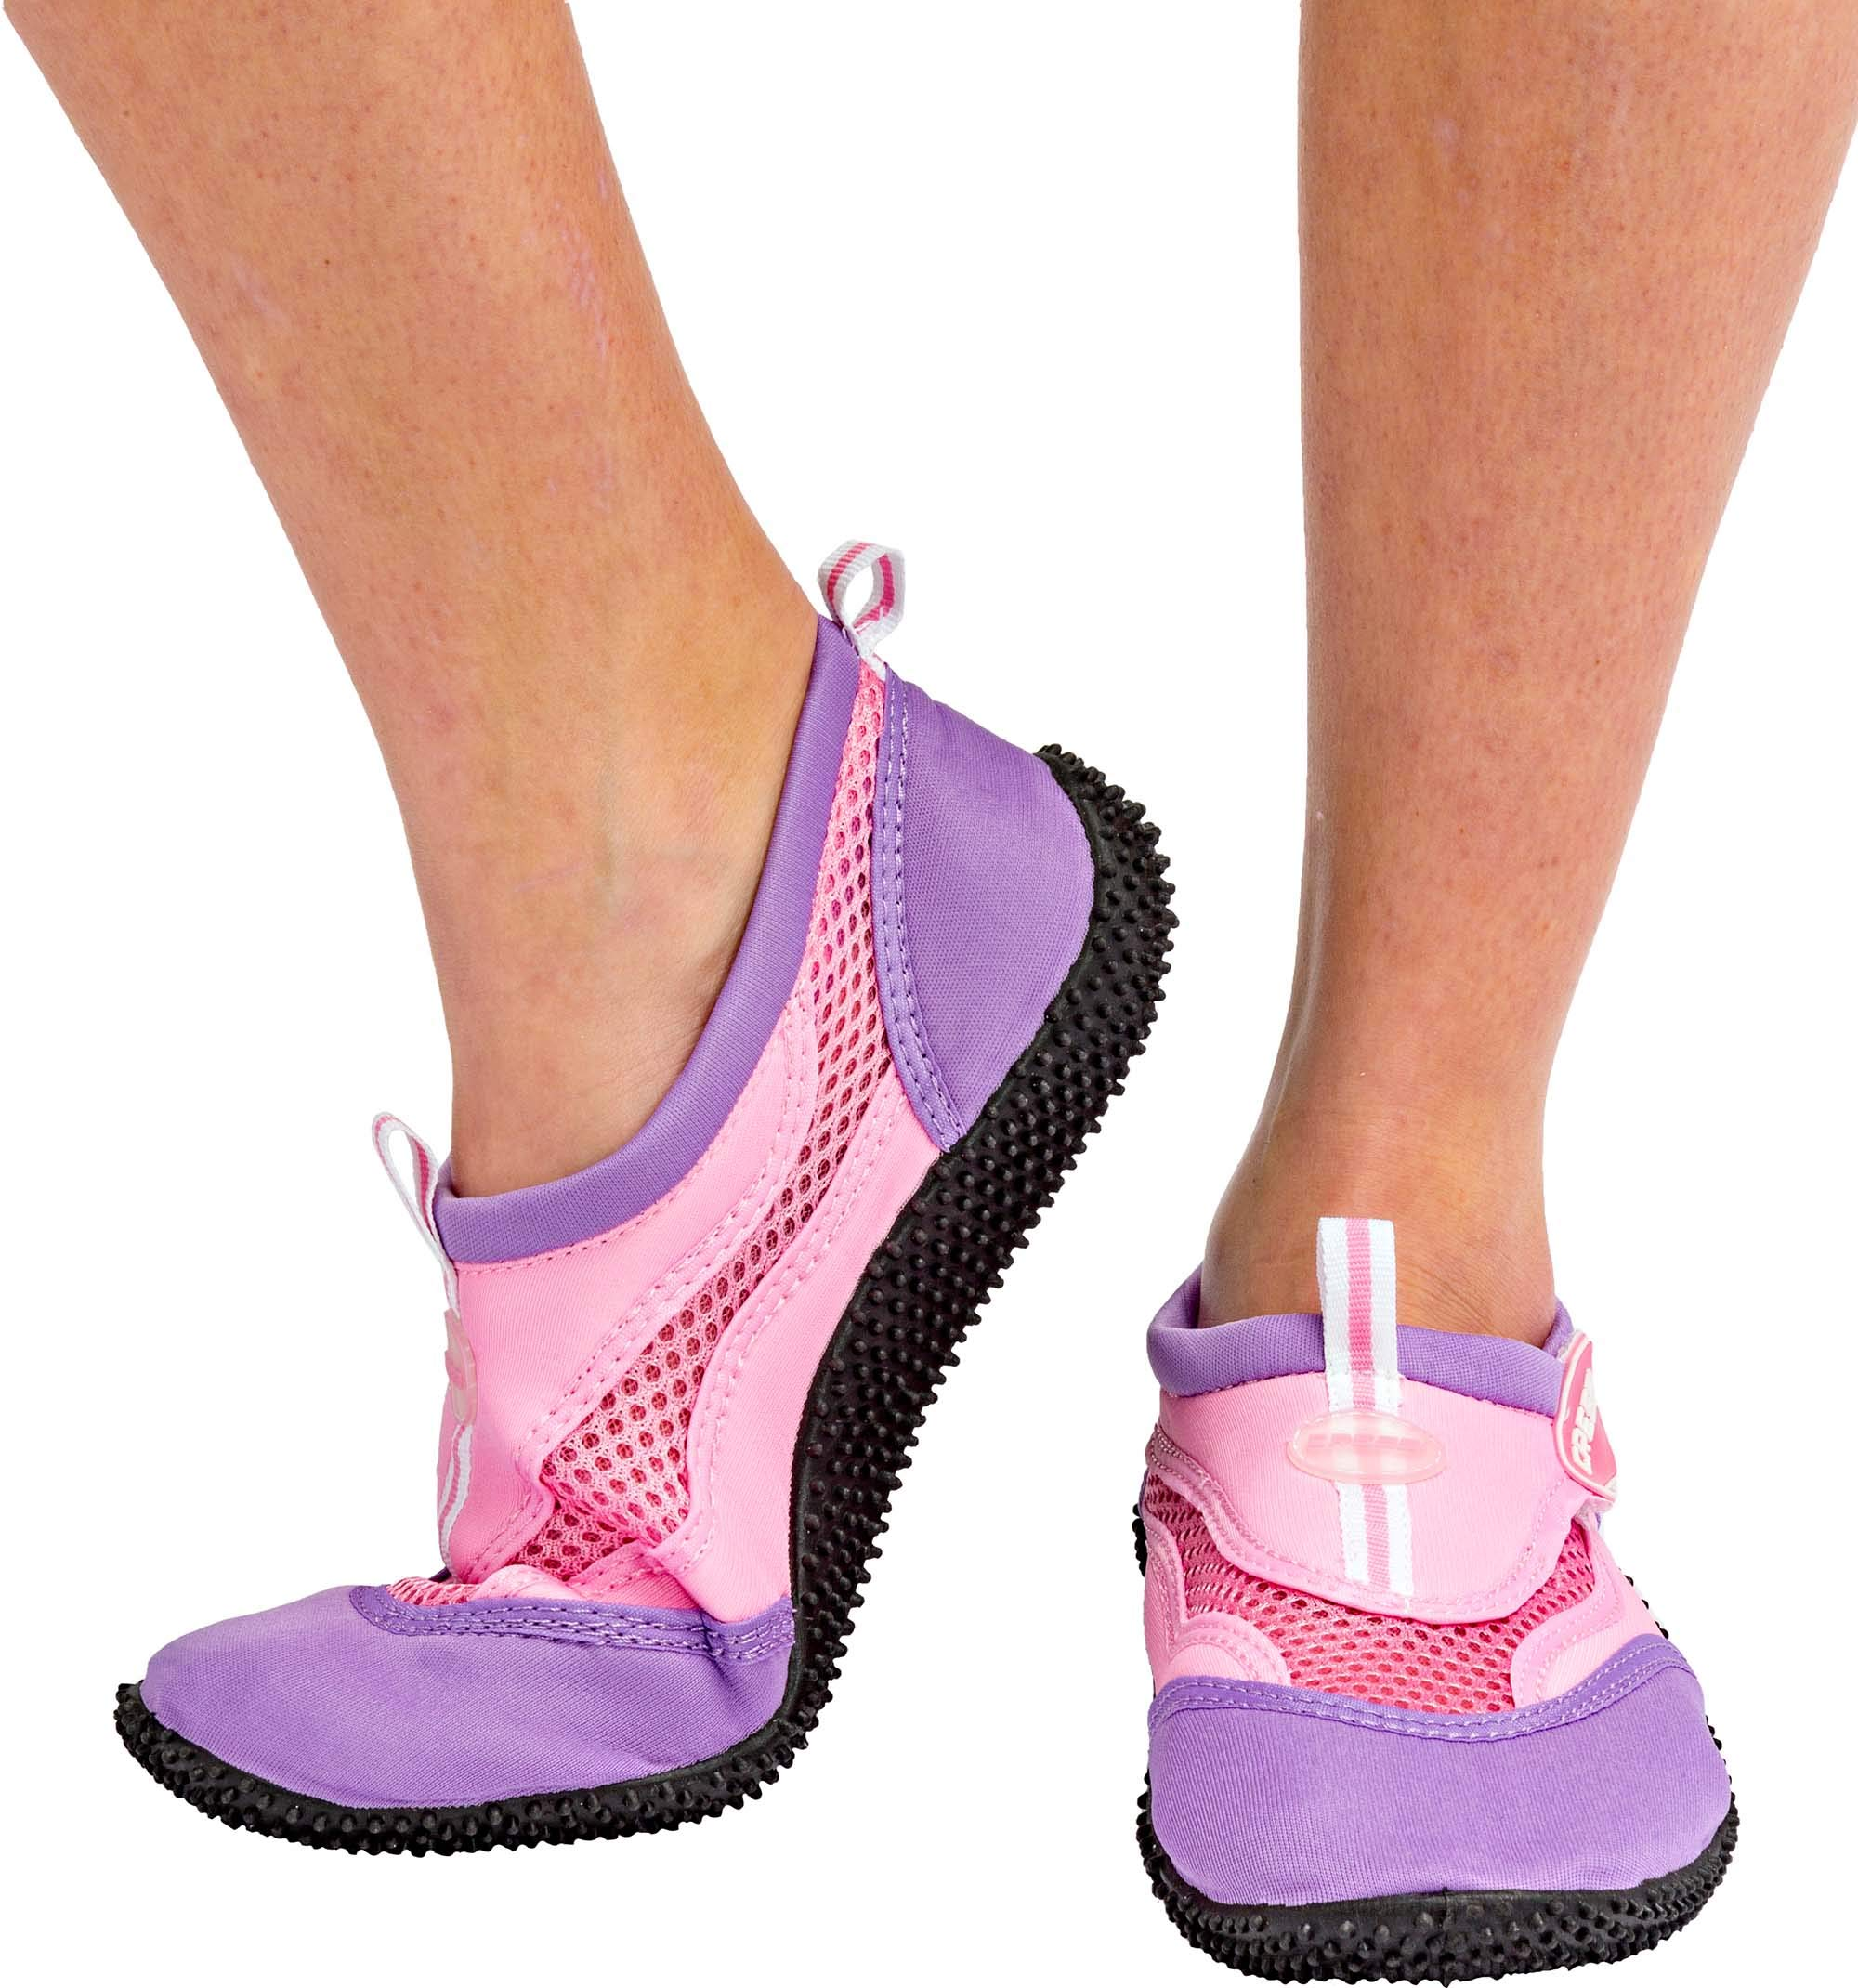 Cressi Unisex Reef Shoes Badeschuhe, Rosa (Rosa/Lila), 27 EU